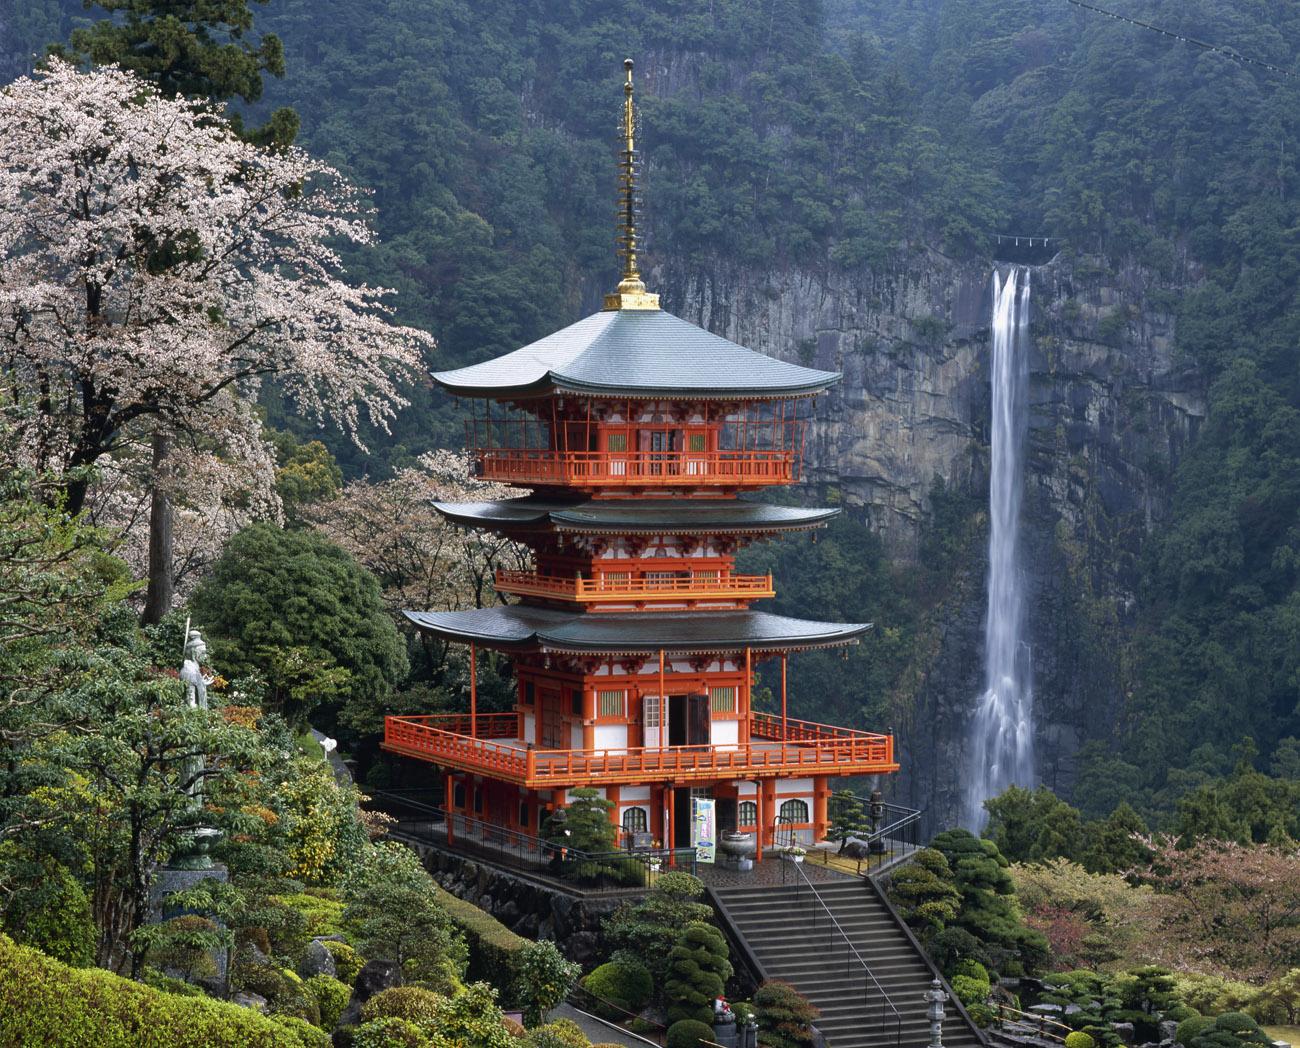 Nachi Waterfall / JAL